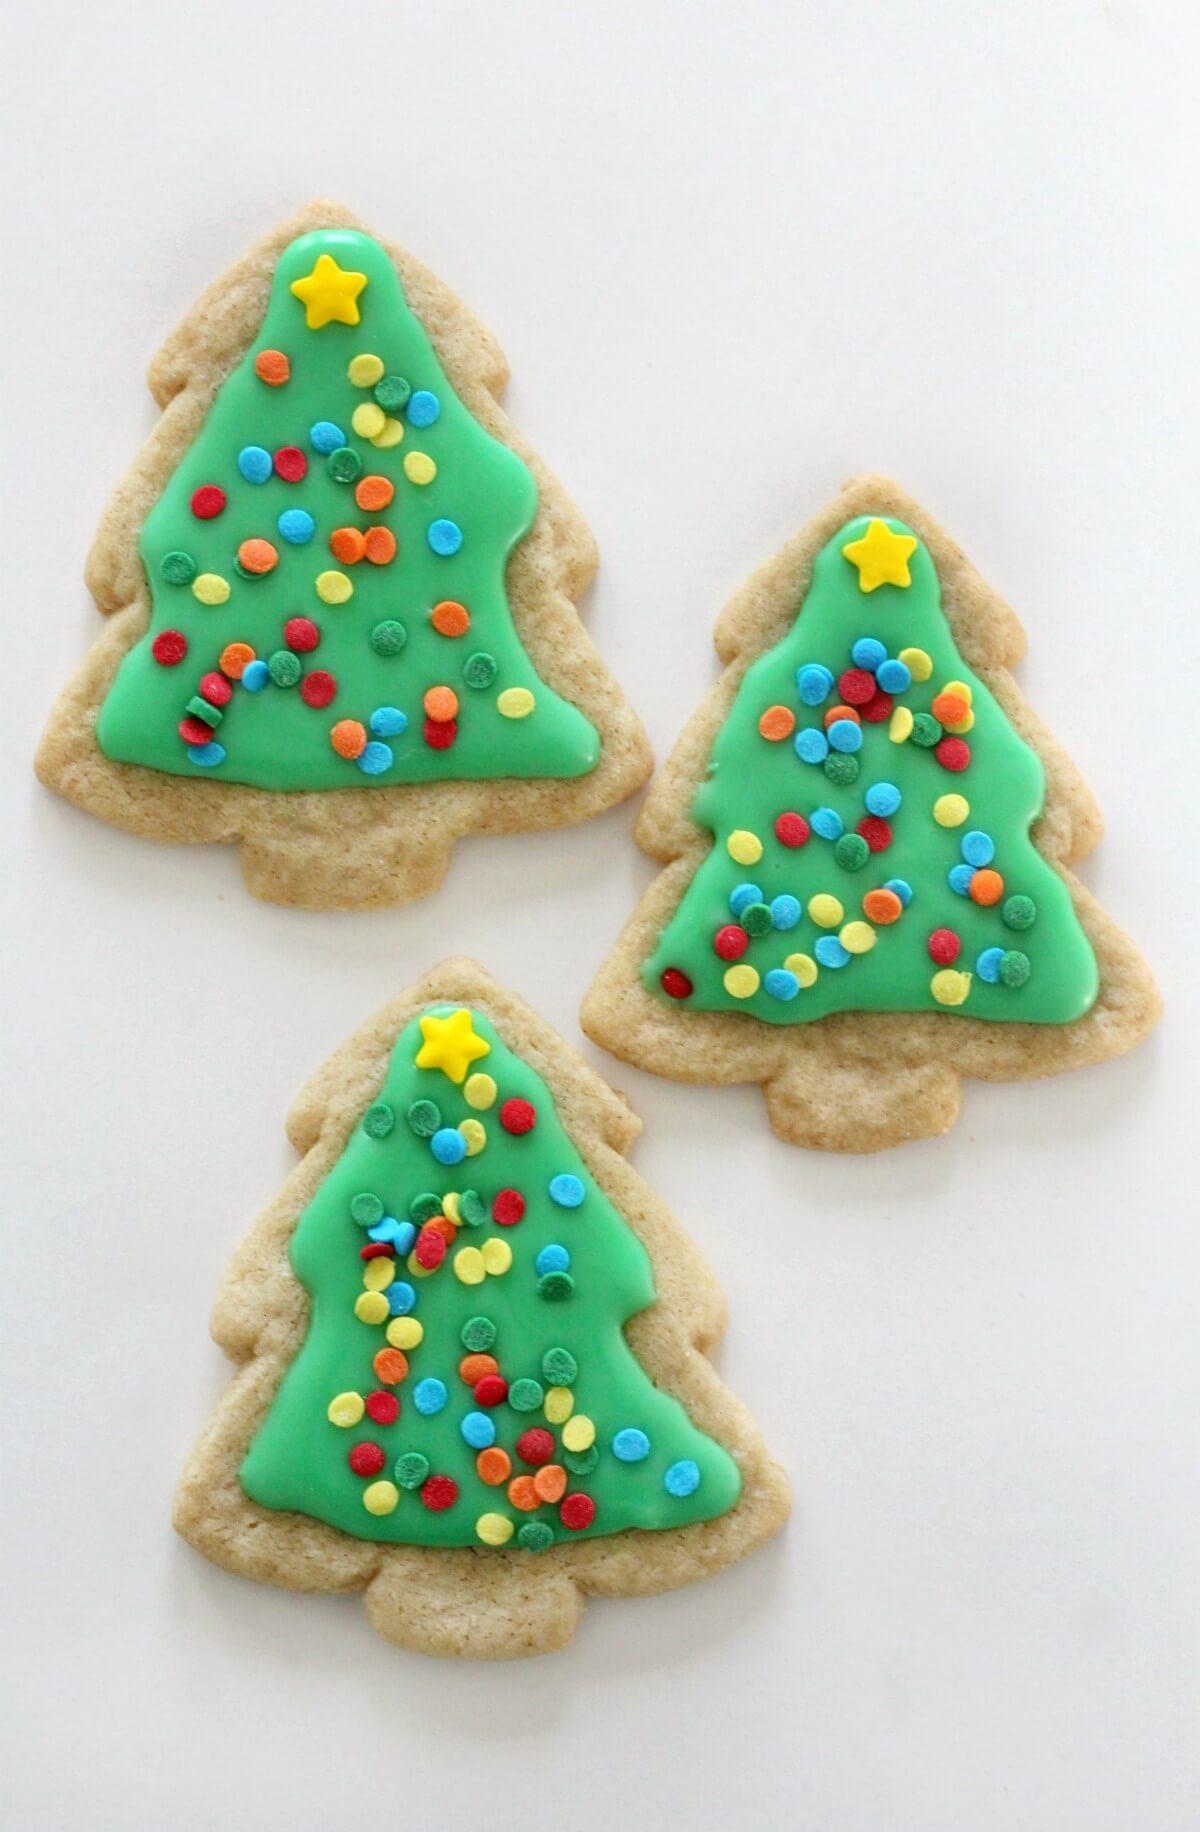 3 decorated gluten-free christmas tree sugar cookies